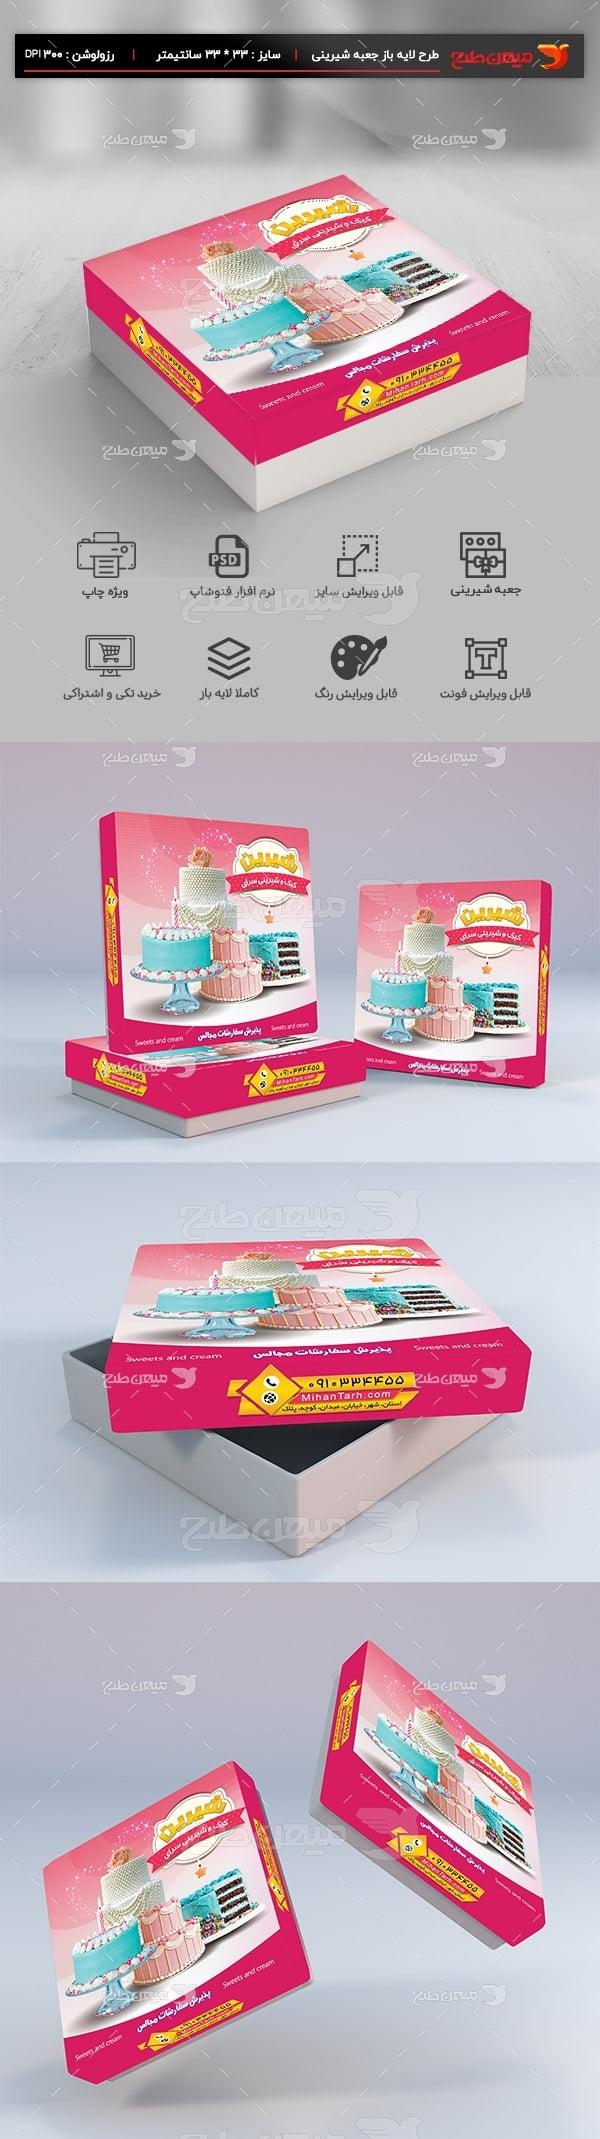 طرح بسته بندی شیرینی سرا